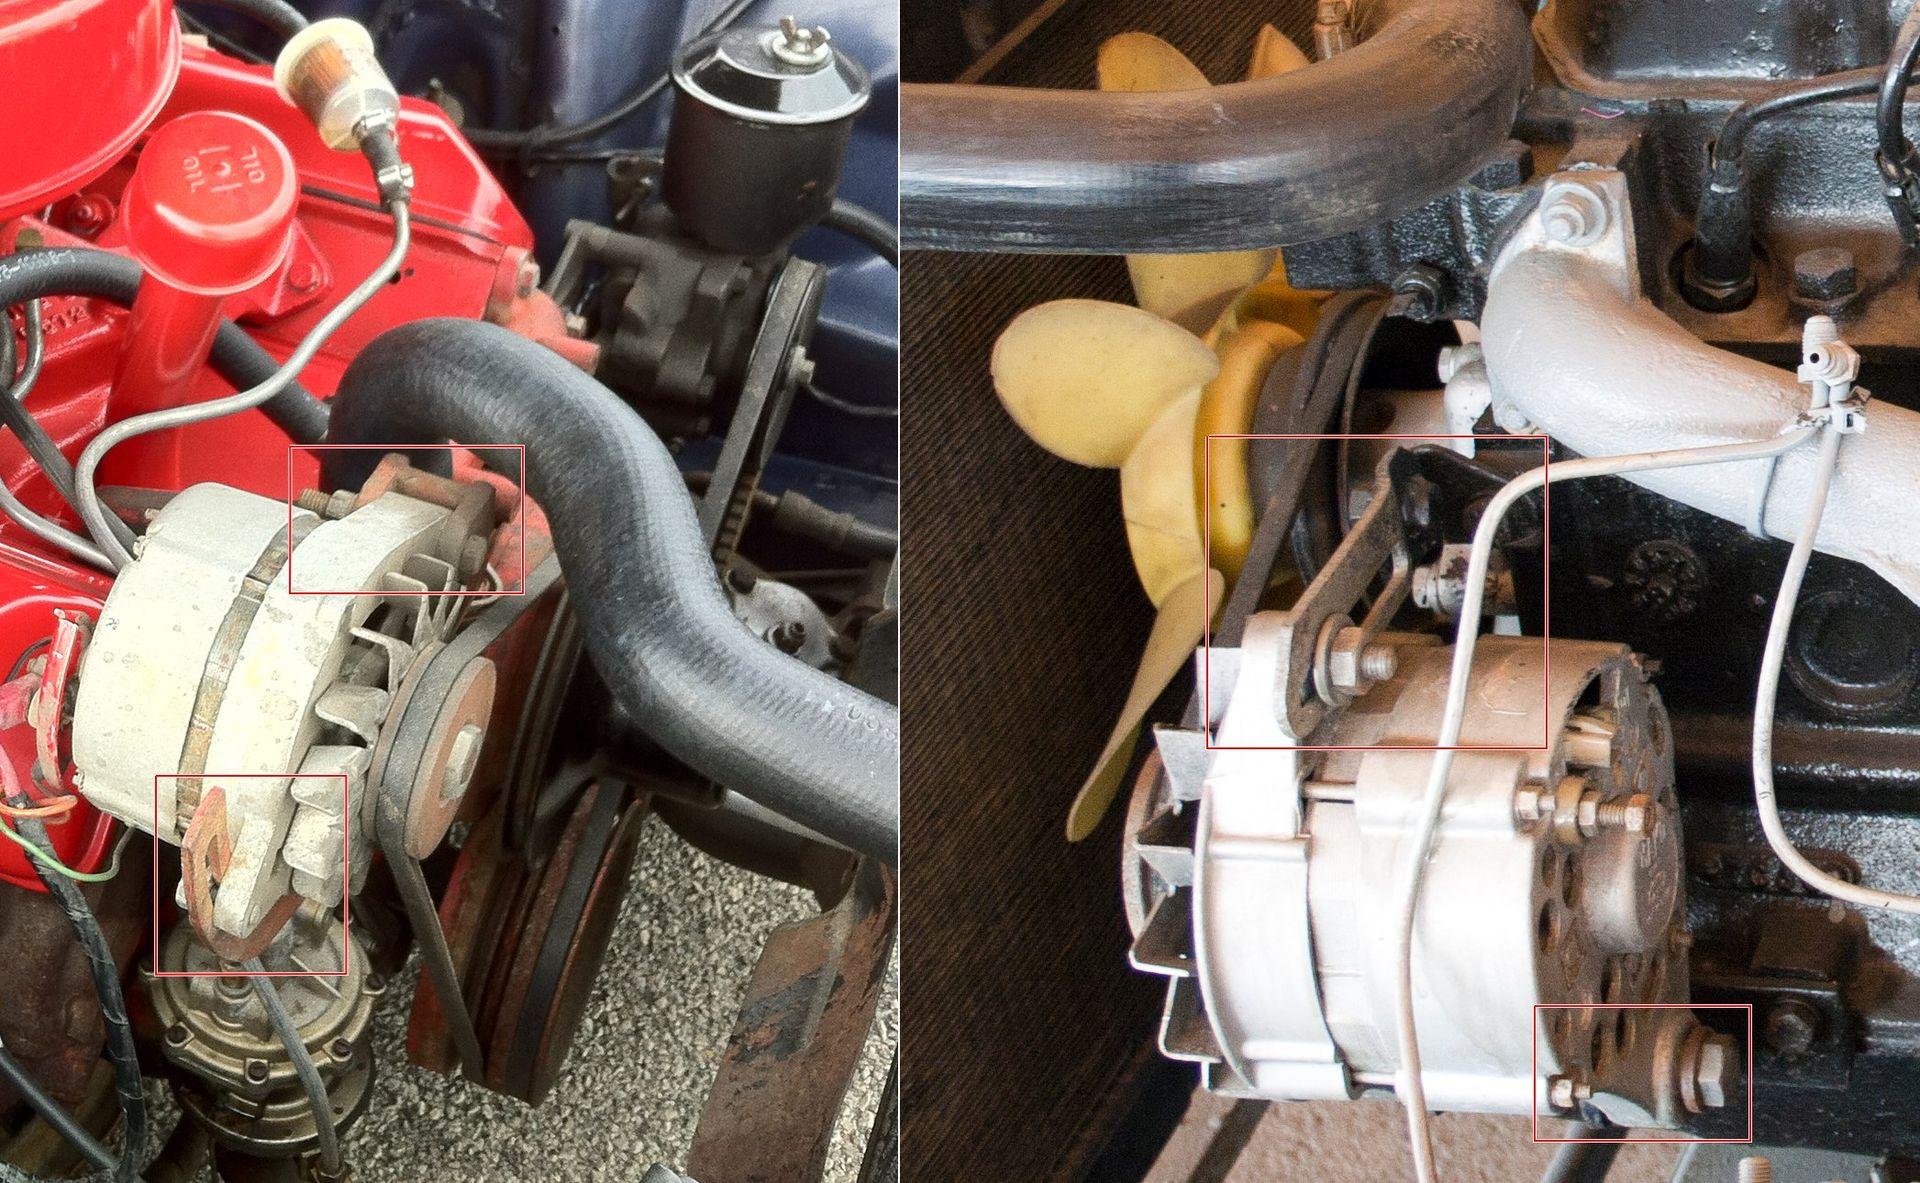 2 PCS Motor Mount Kit For CHEVROLET K20 Suburban 4.8L 292 Engine 1973-1982